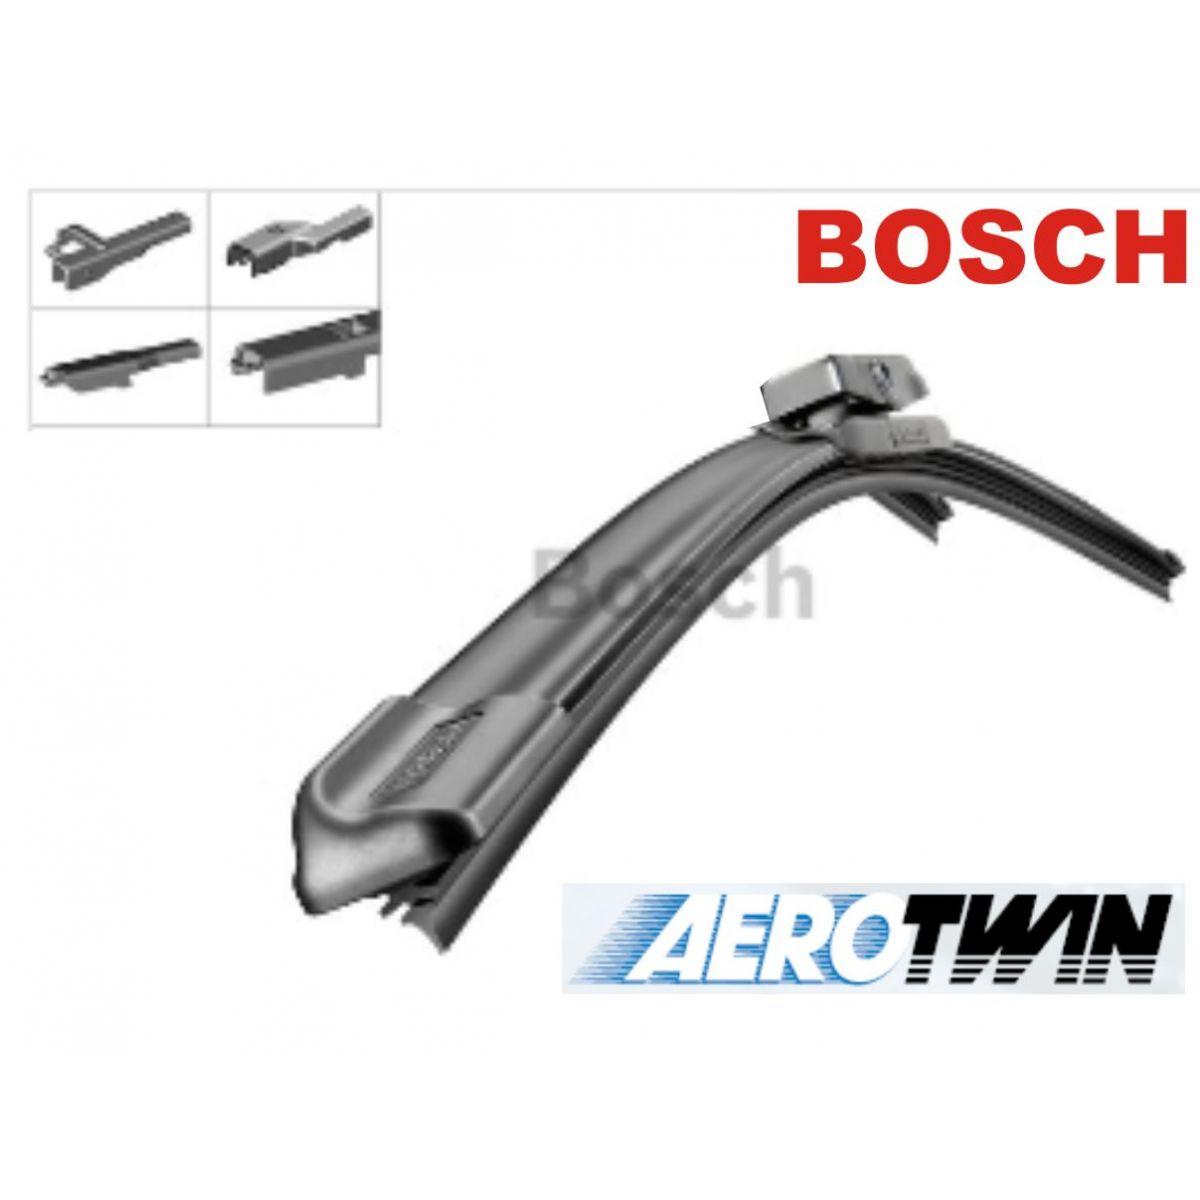 Palheta Bosch Aerotwin Plus Limpador de para brisa Bosch AP 22 M - 550 MM